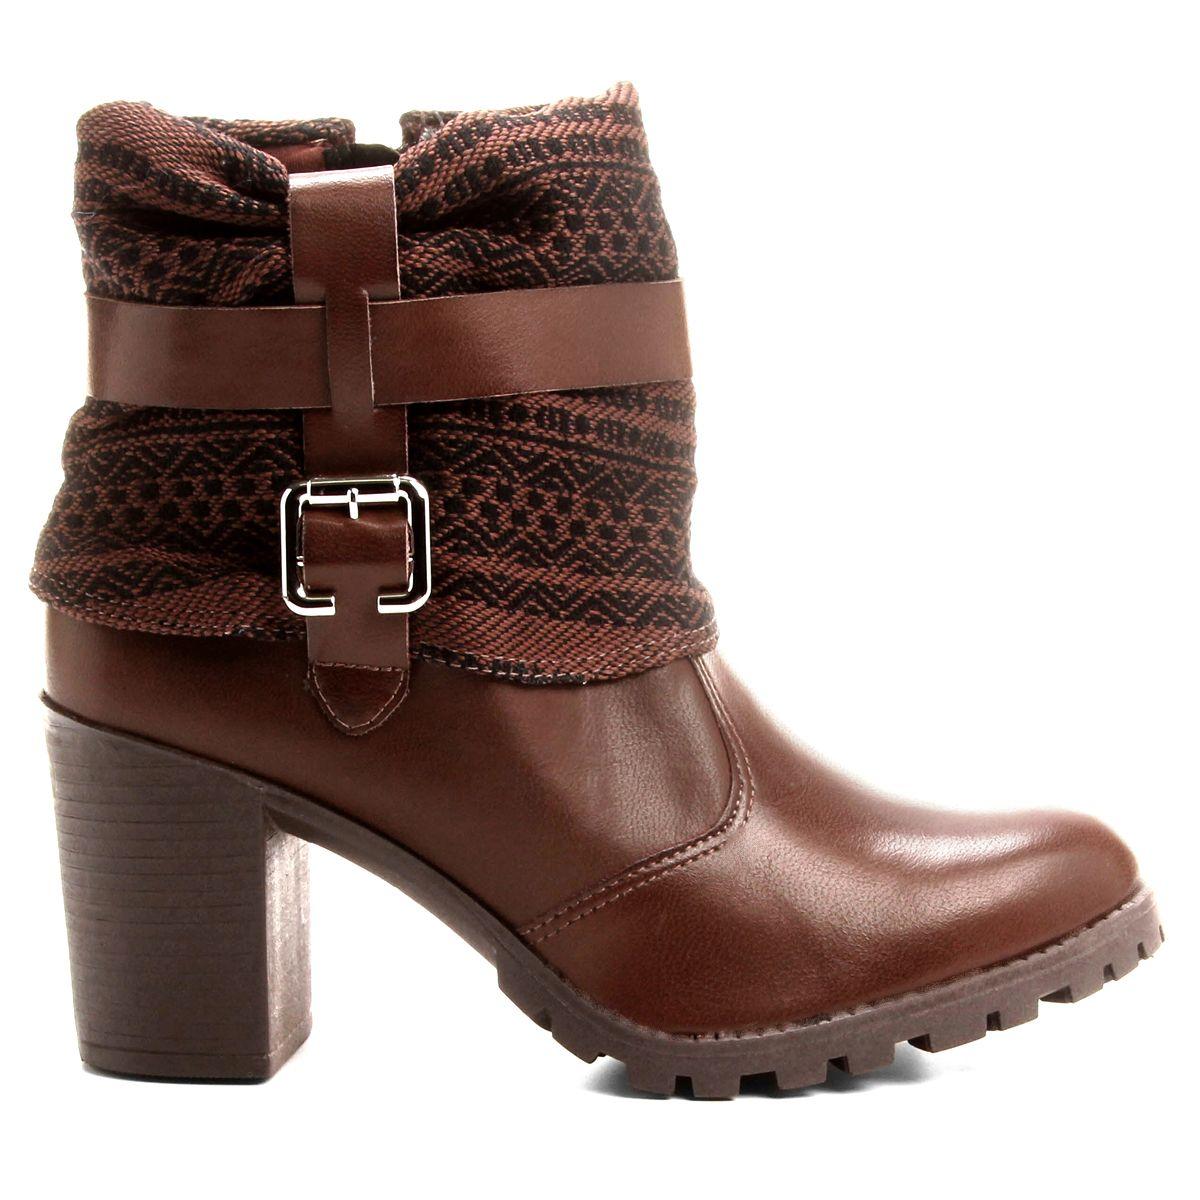 9a73c3eae7 Bota Mississipi Salto Grosso Preto | Zattini | Shoes | Sapatos ...